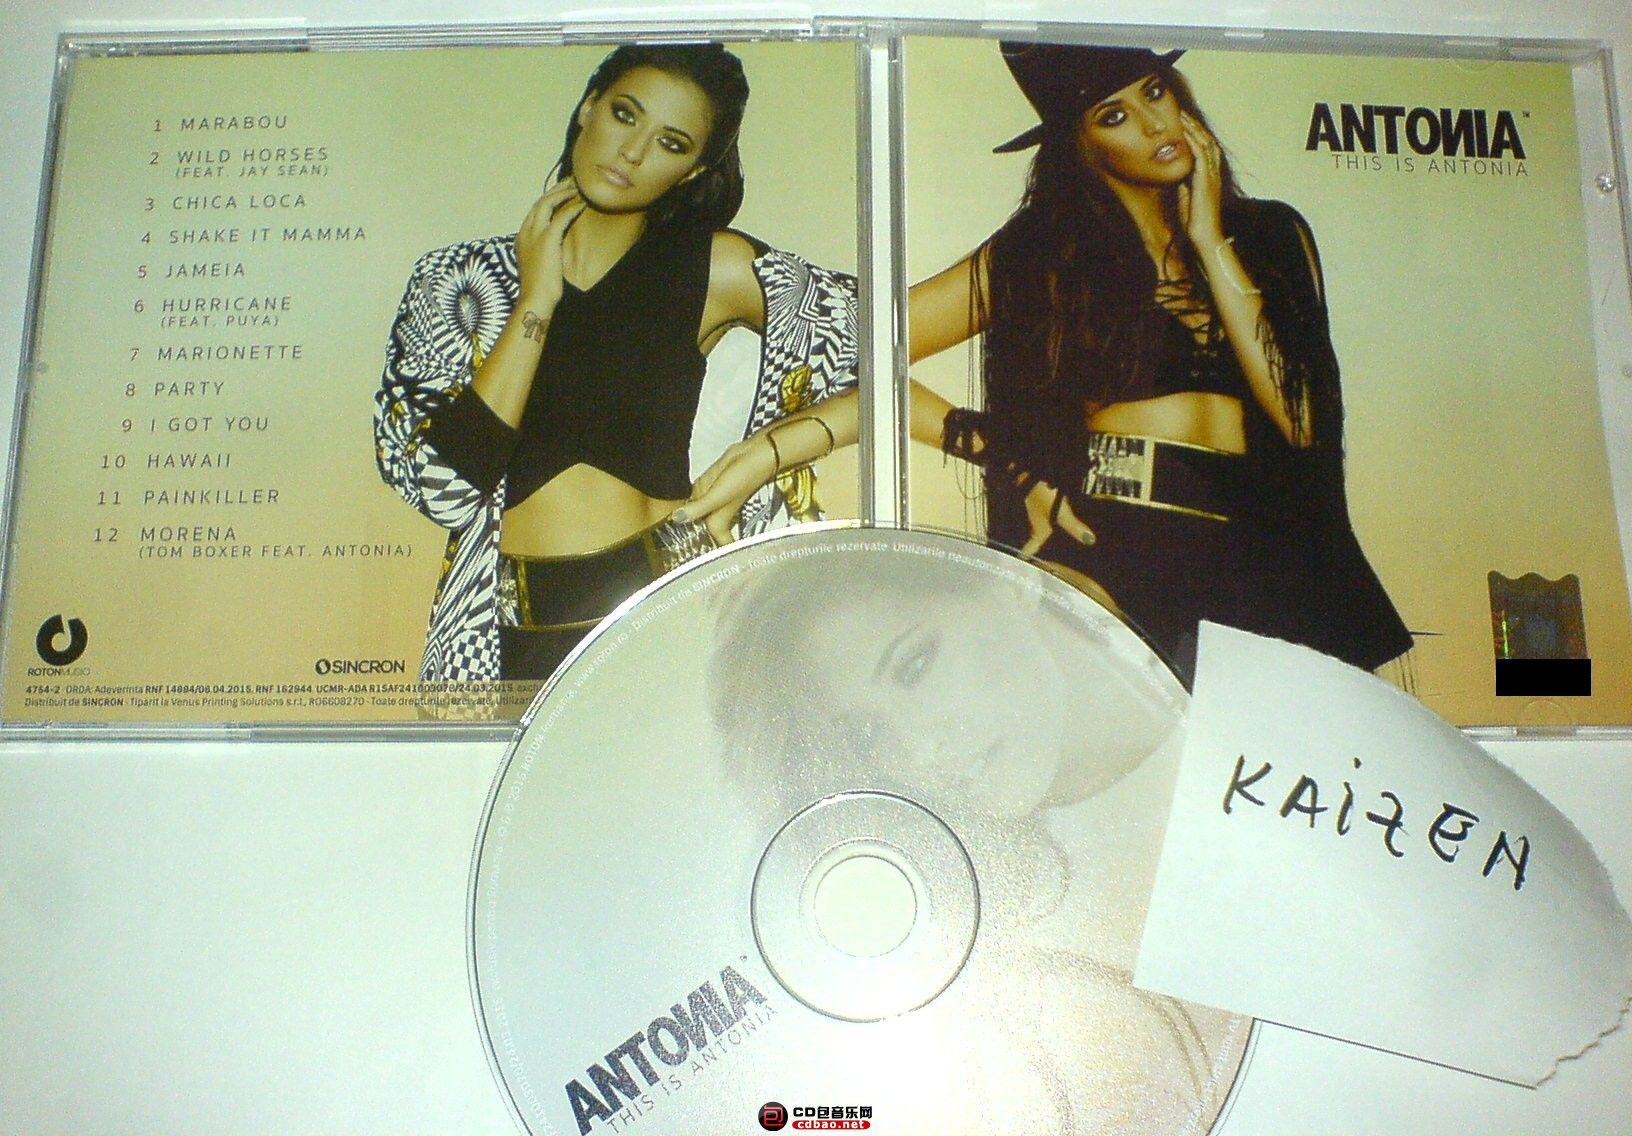 00-antonia-this_is_antonia-cd-flac-2015.jpg